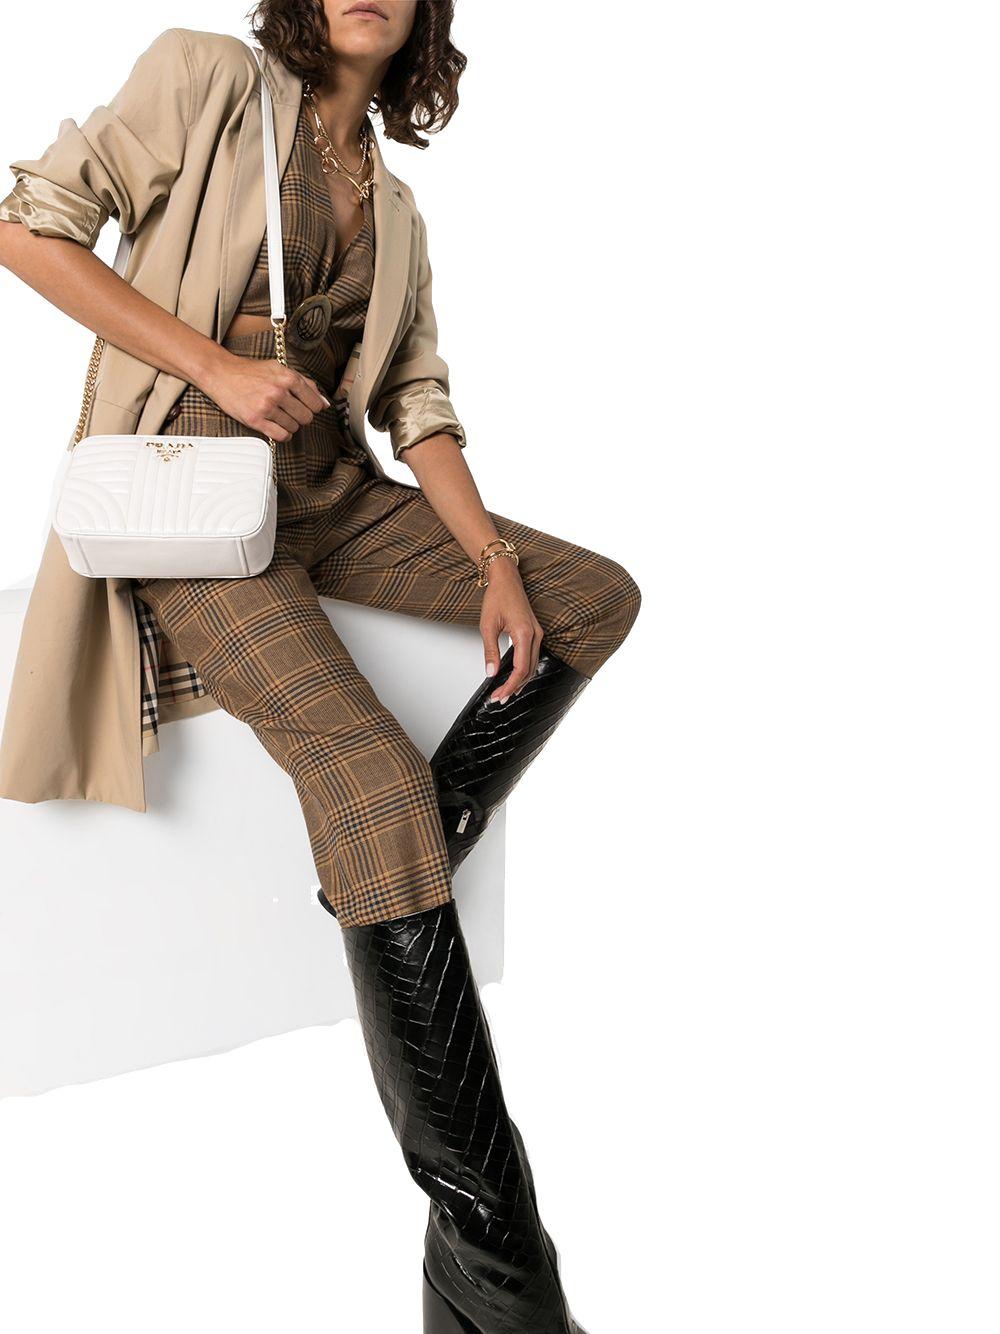 PRADA Leathers PRADA WOMEN'S WHITE LEATHER SHOULDER BAG